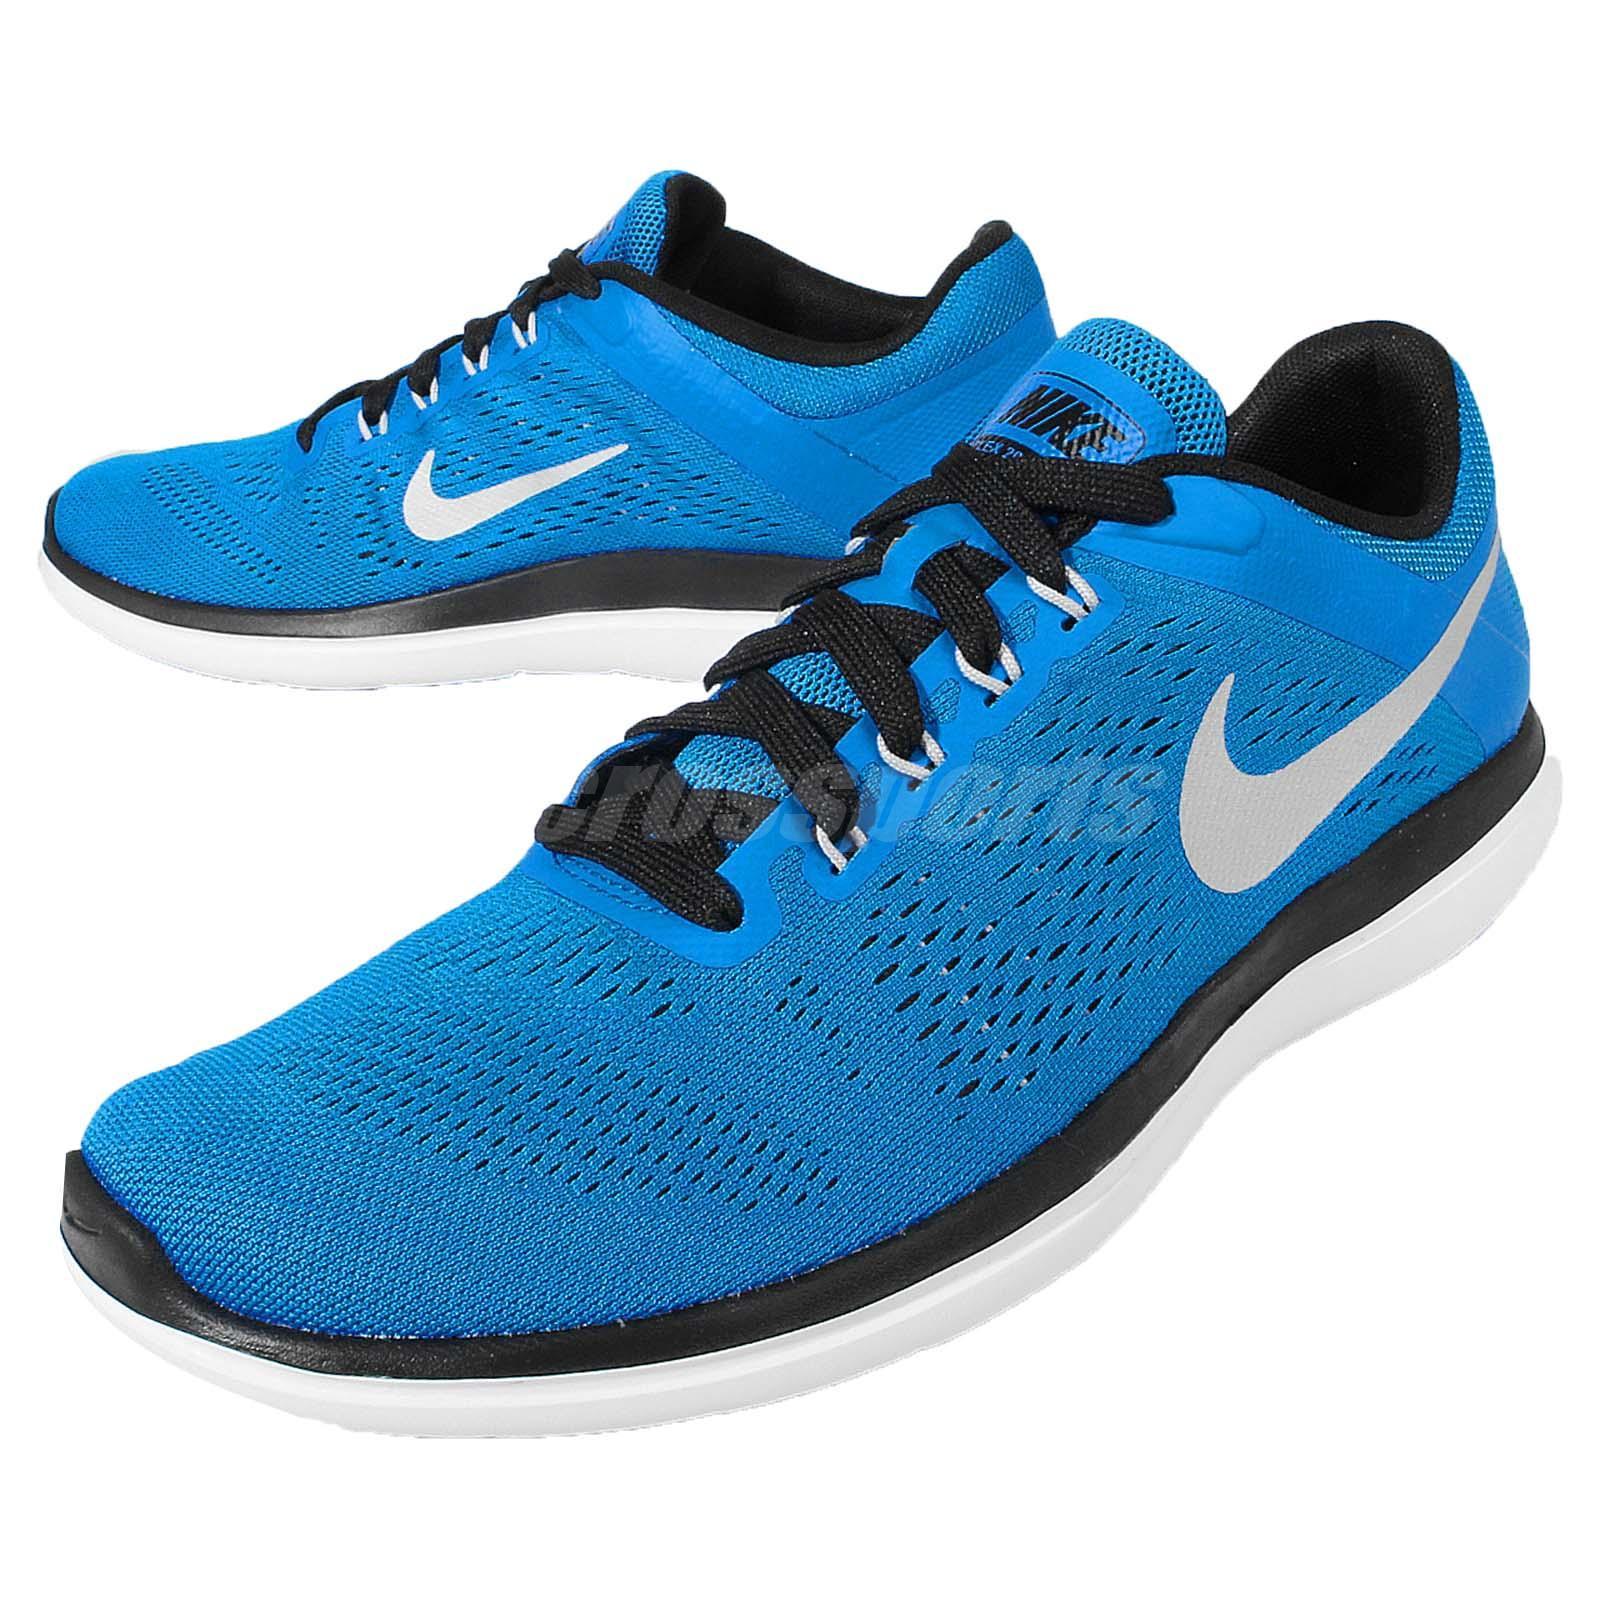 nike flex 2016 rn run blue black mens running shoes. Black Bedroom Furniture Sets. Home Design Ideas